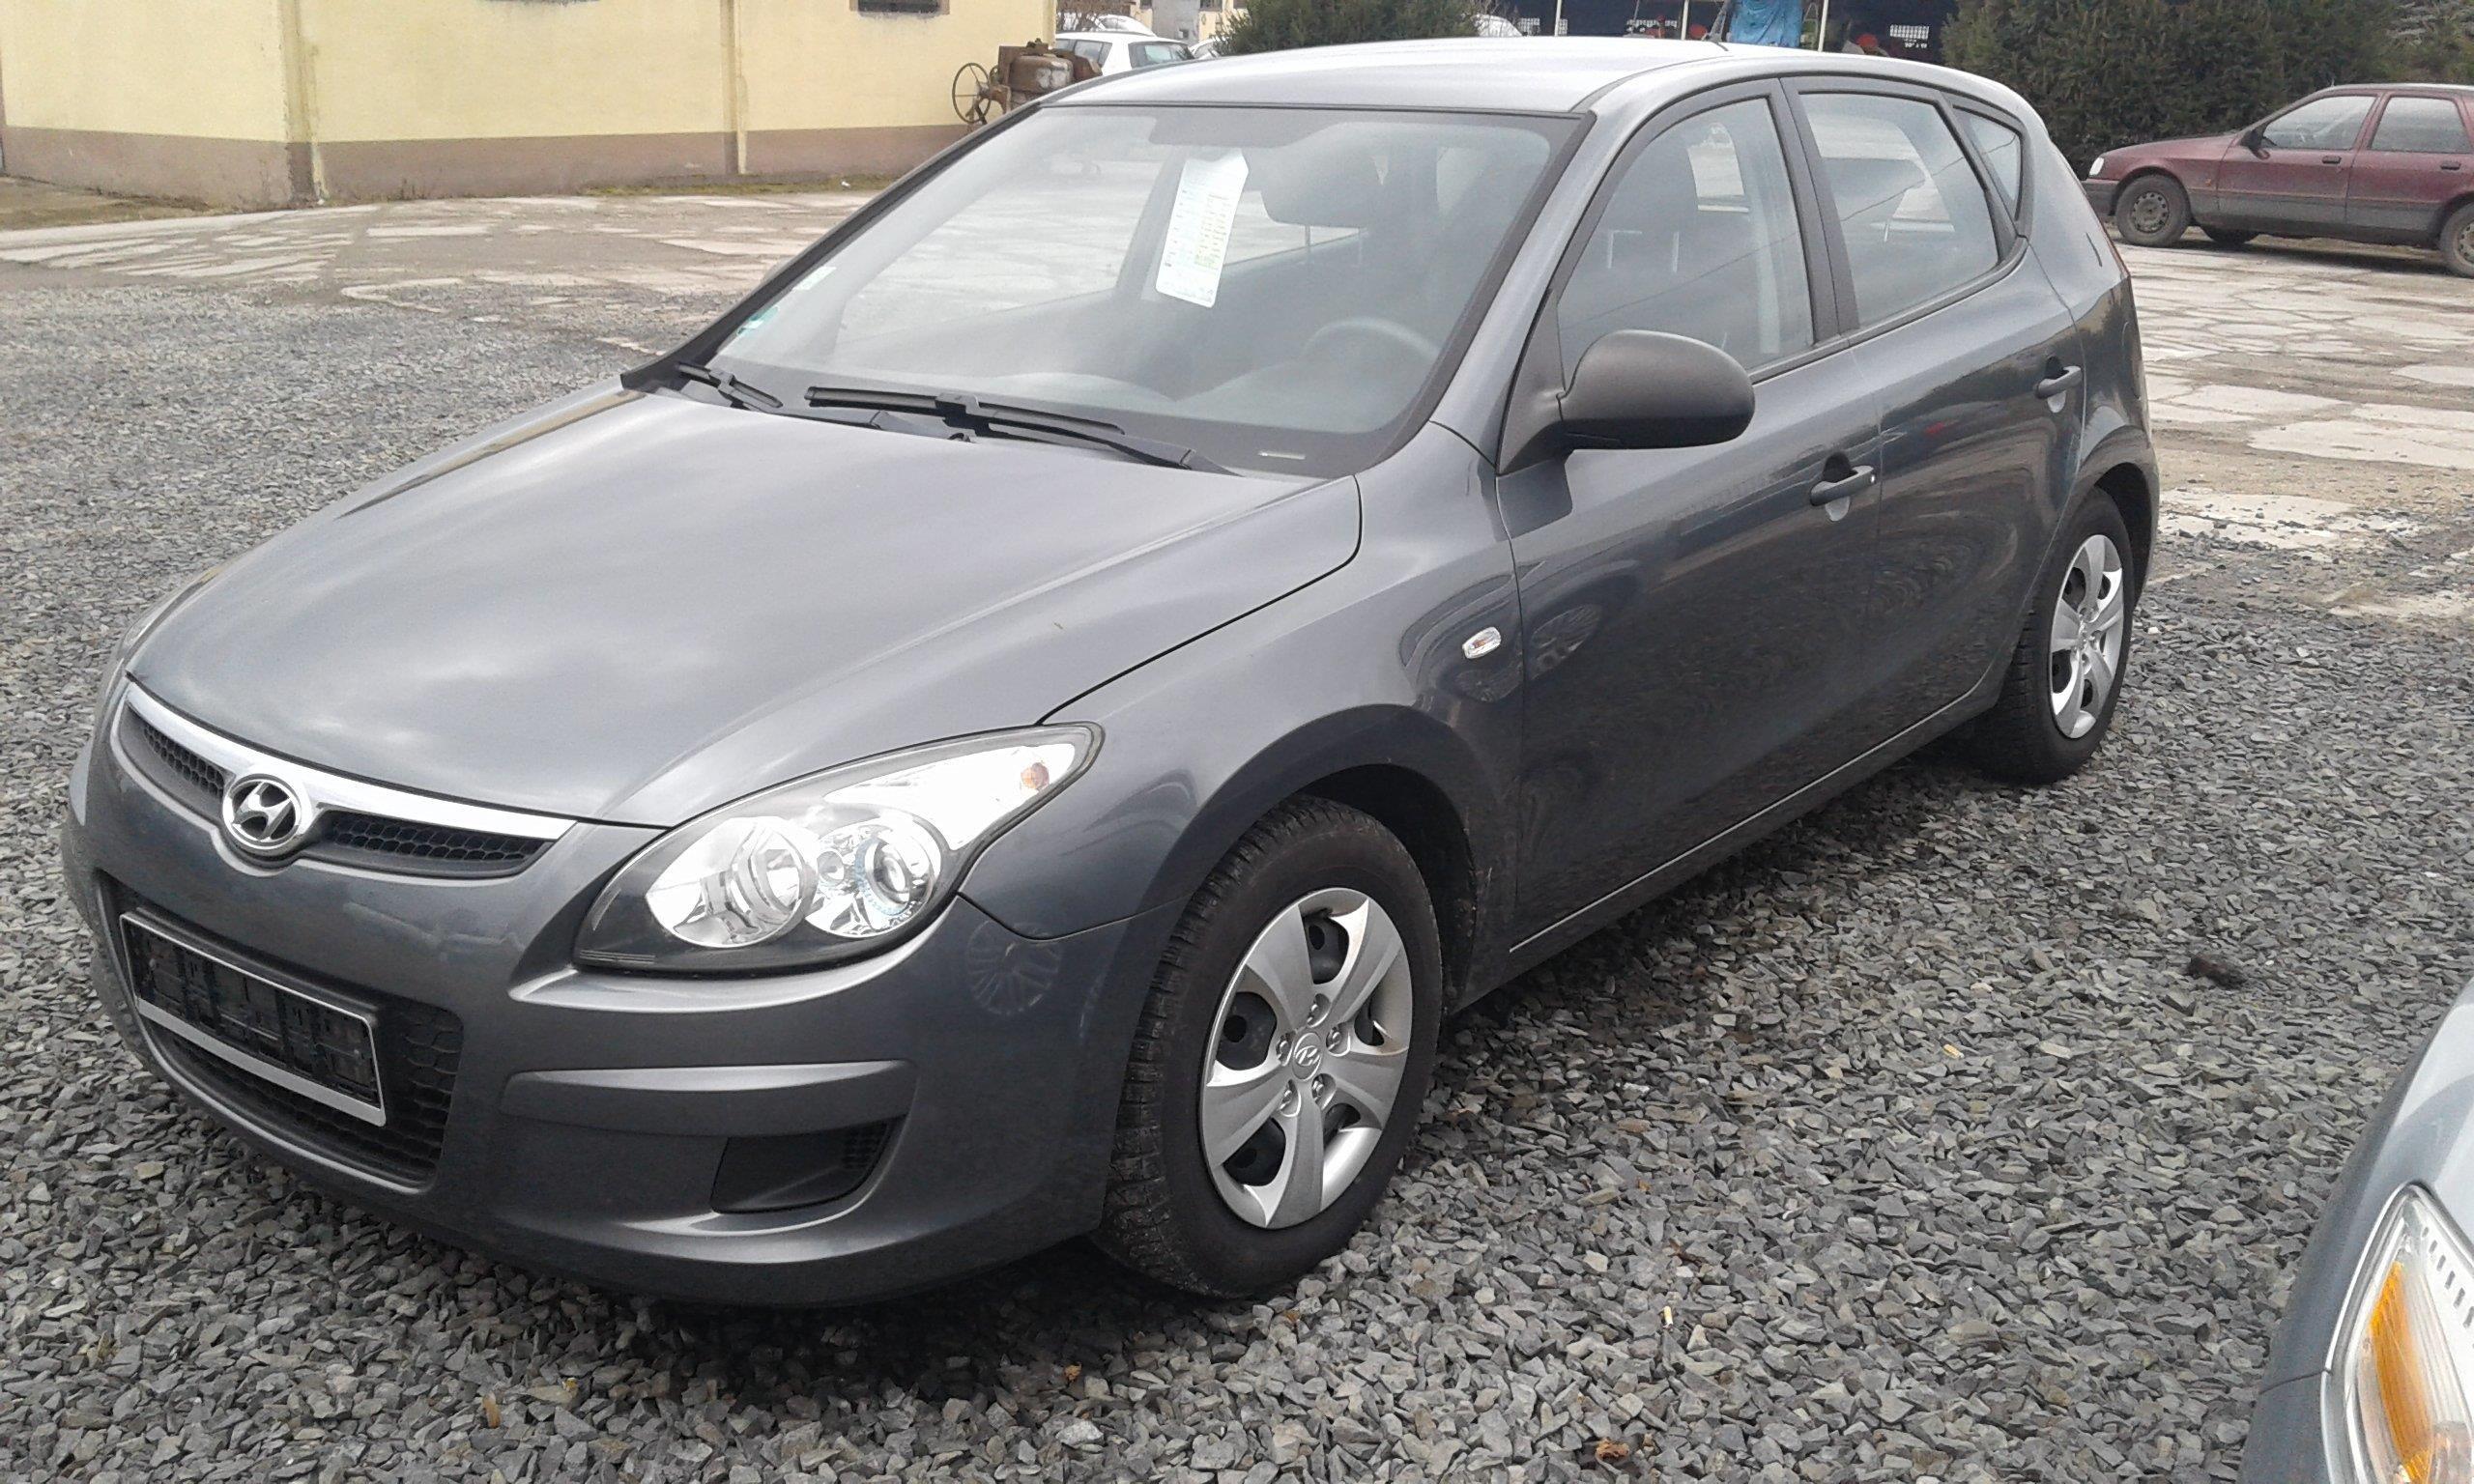 13de5e27251e42 Hyundai i30 I 2009 benzyna 109KM hatchback szary - Opinie i ceny na ...